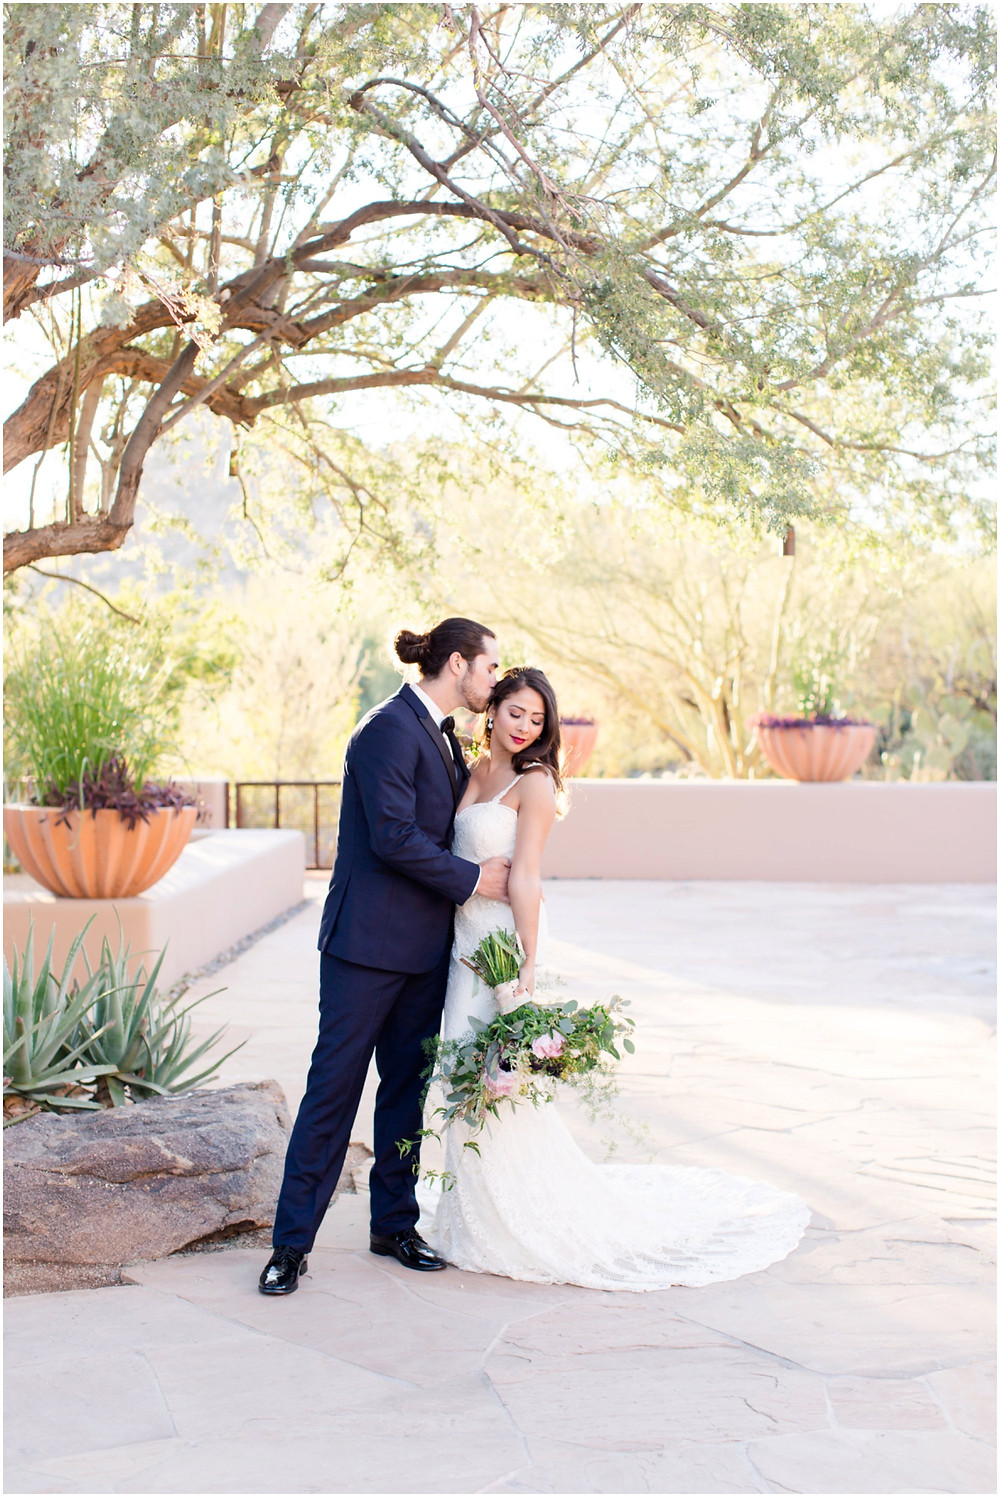 The Fours Seasons Scottsdale Weddings